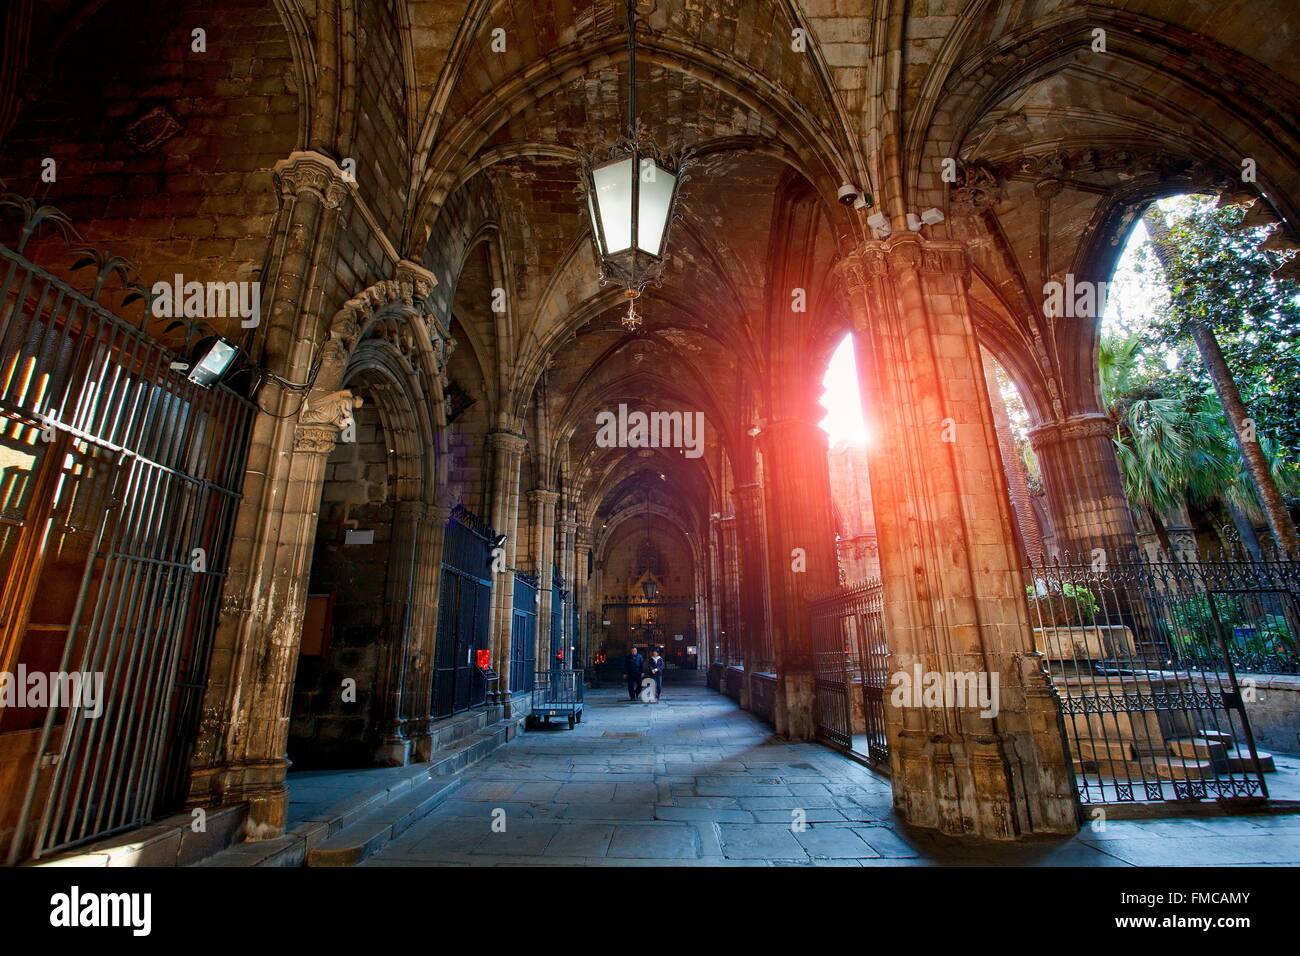 España, Cataluña, Barcelona, la Catedral de Barcelona Foto de stock